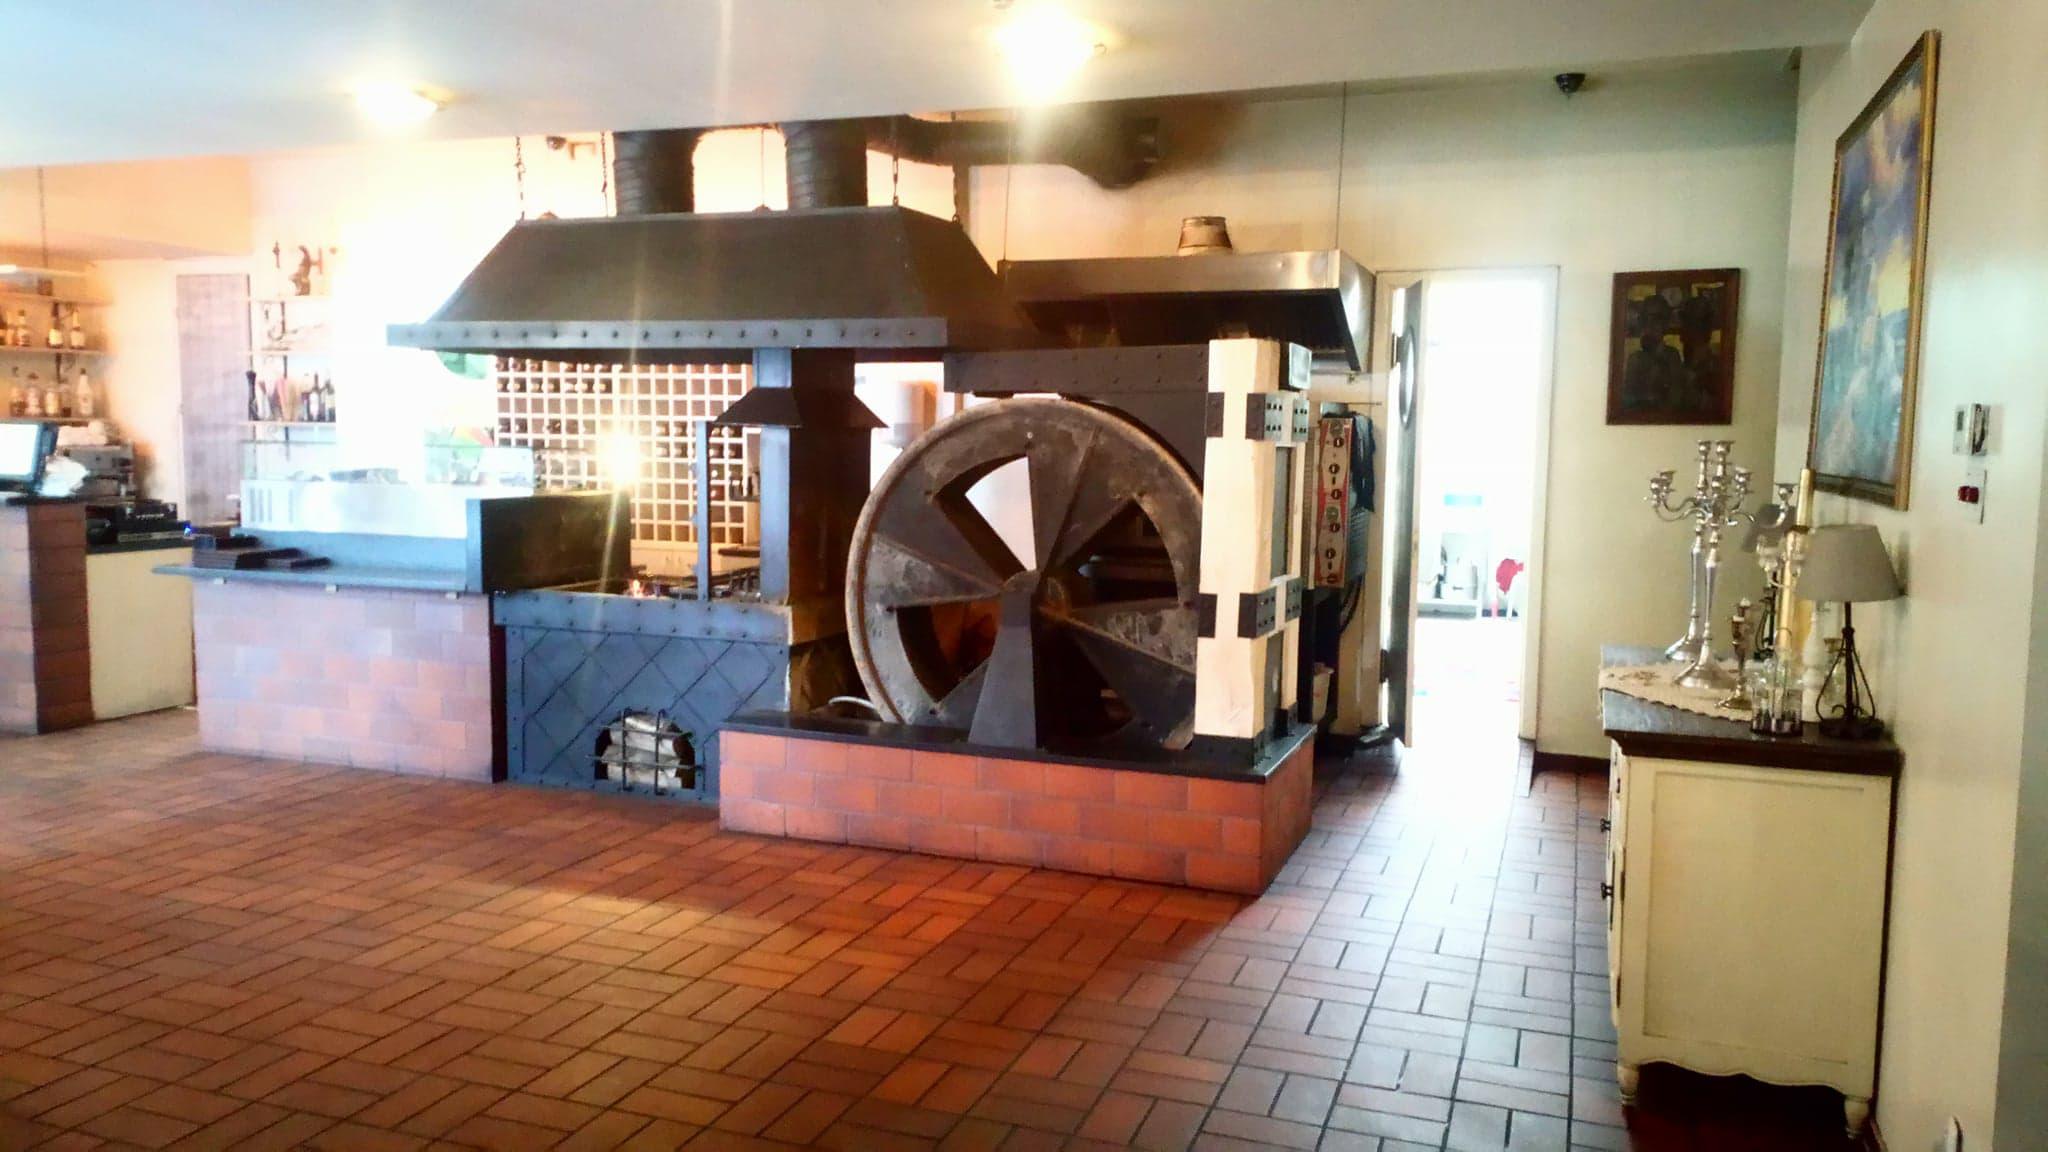 Restoranas Baltazaras